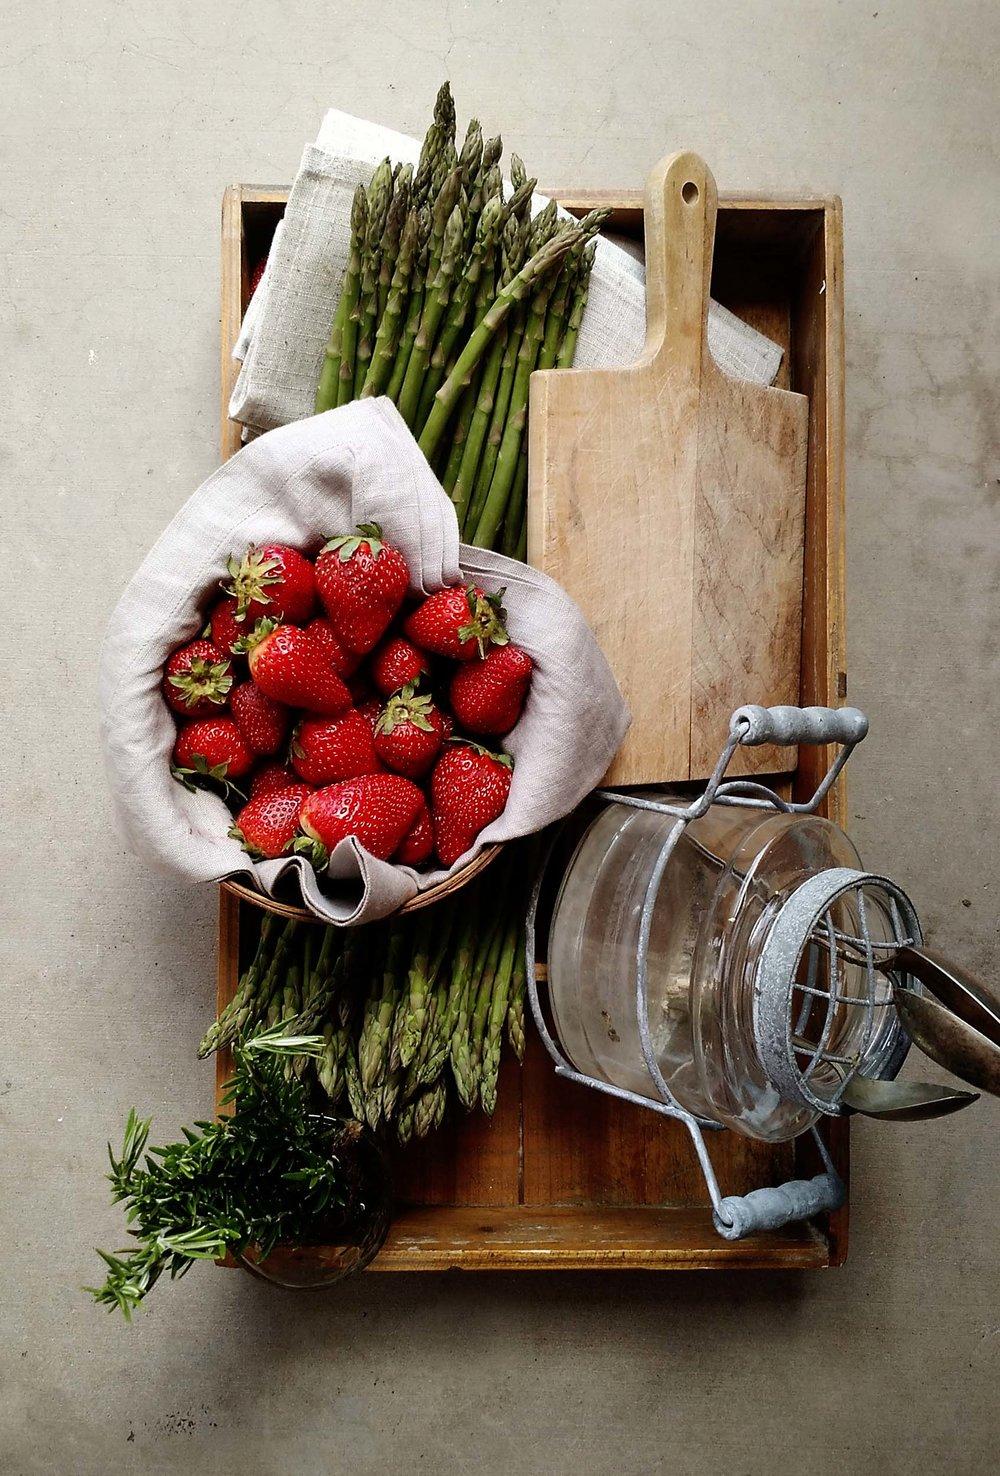 strawberries and asparagus.jpg